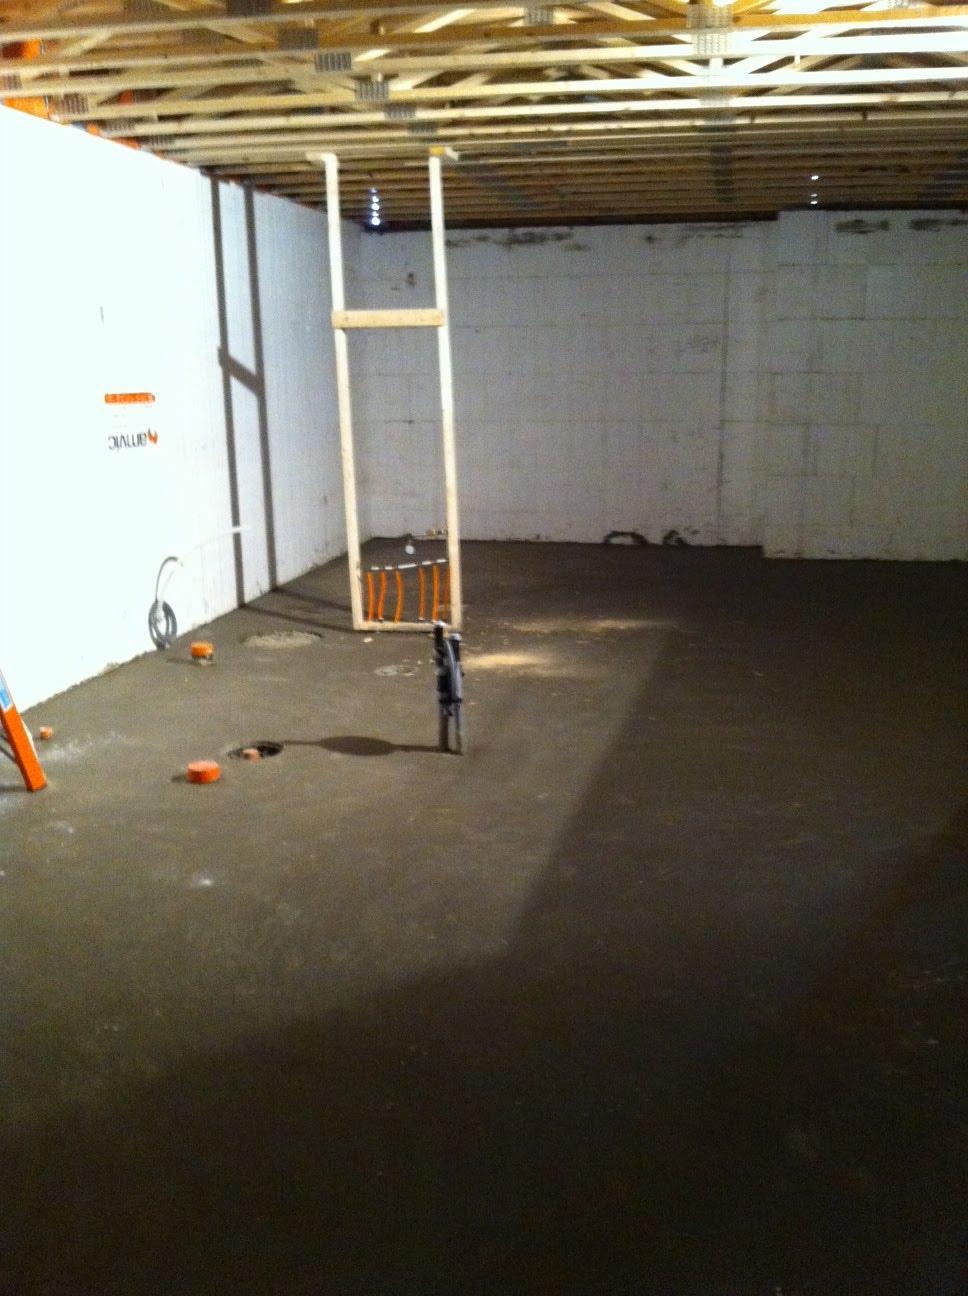 plumbing rough in is done basement floor is poured framing is